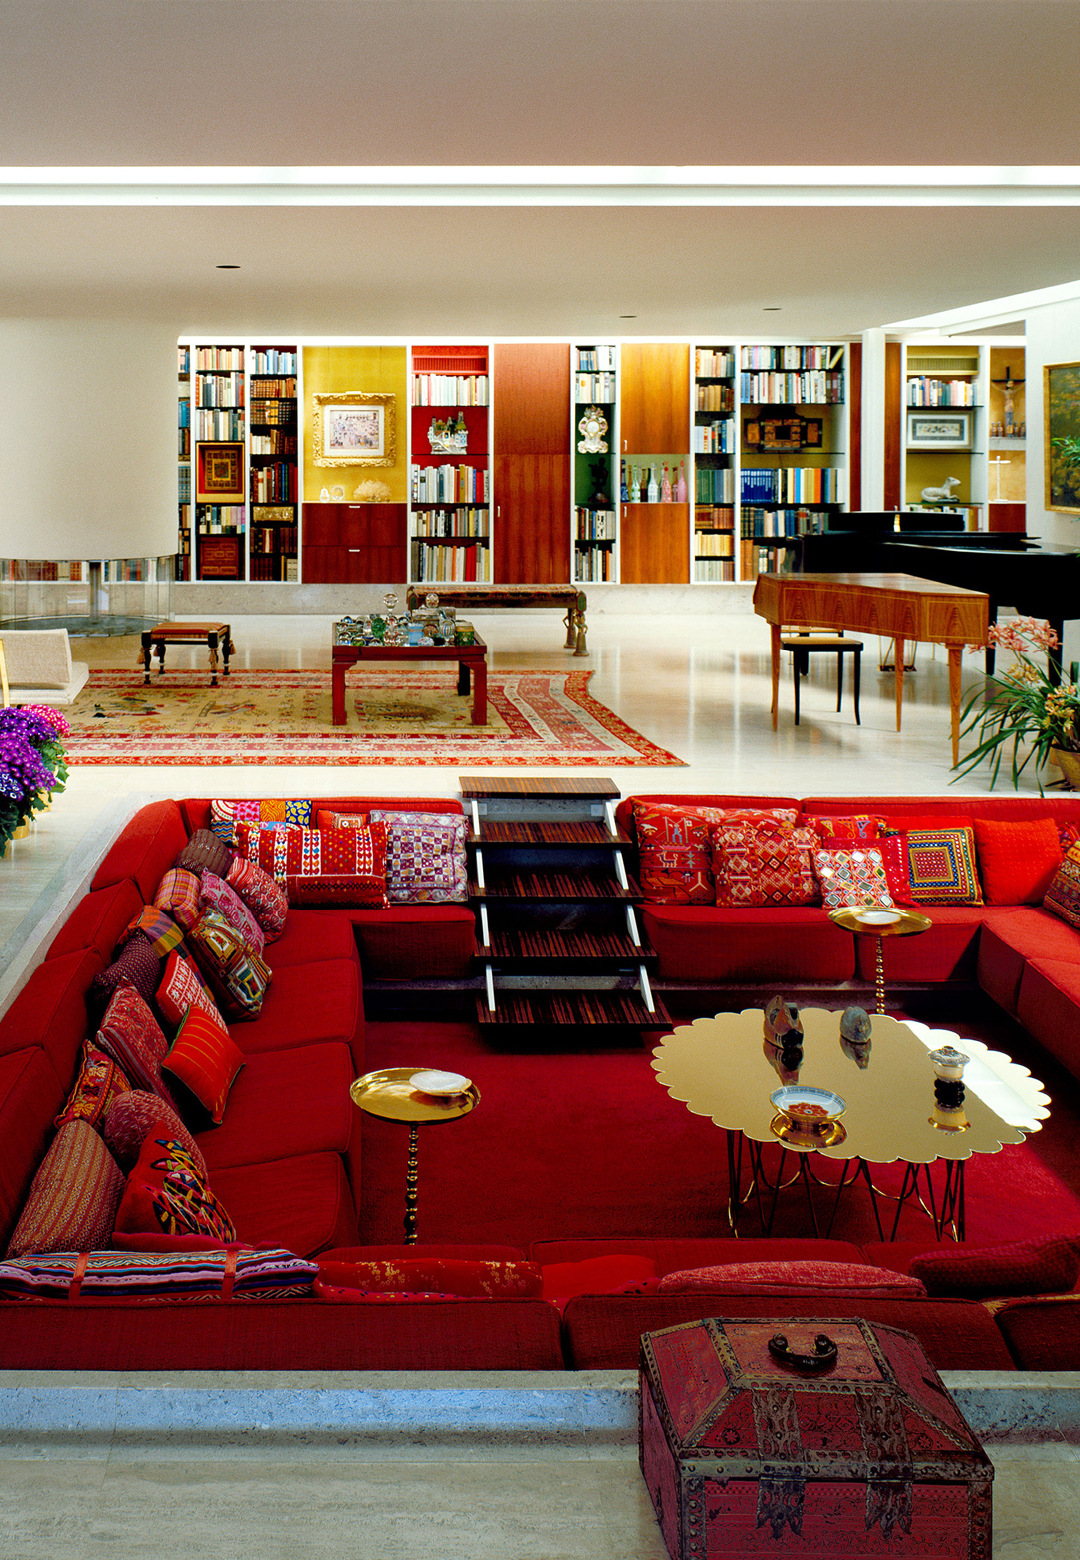 Miller House, a mid-century modern home designed by Alexander Girard | Alexander Girard: A Designer's Universe | Alexander Girard | STIRworld